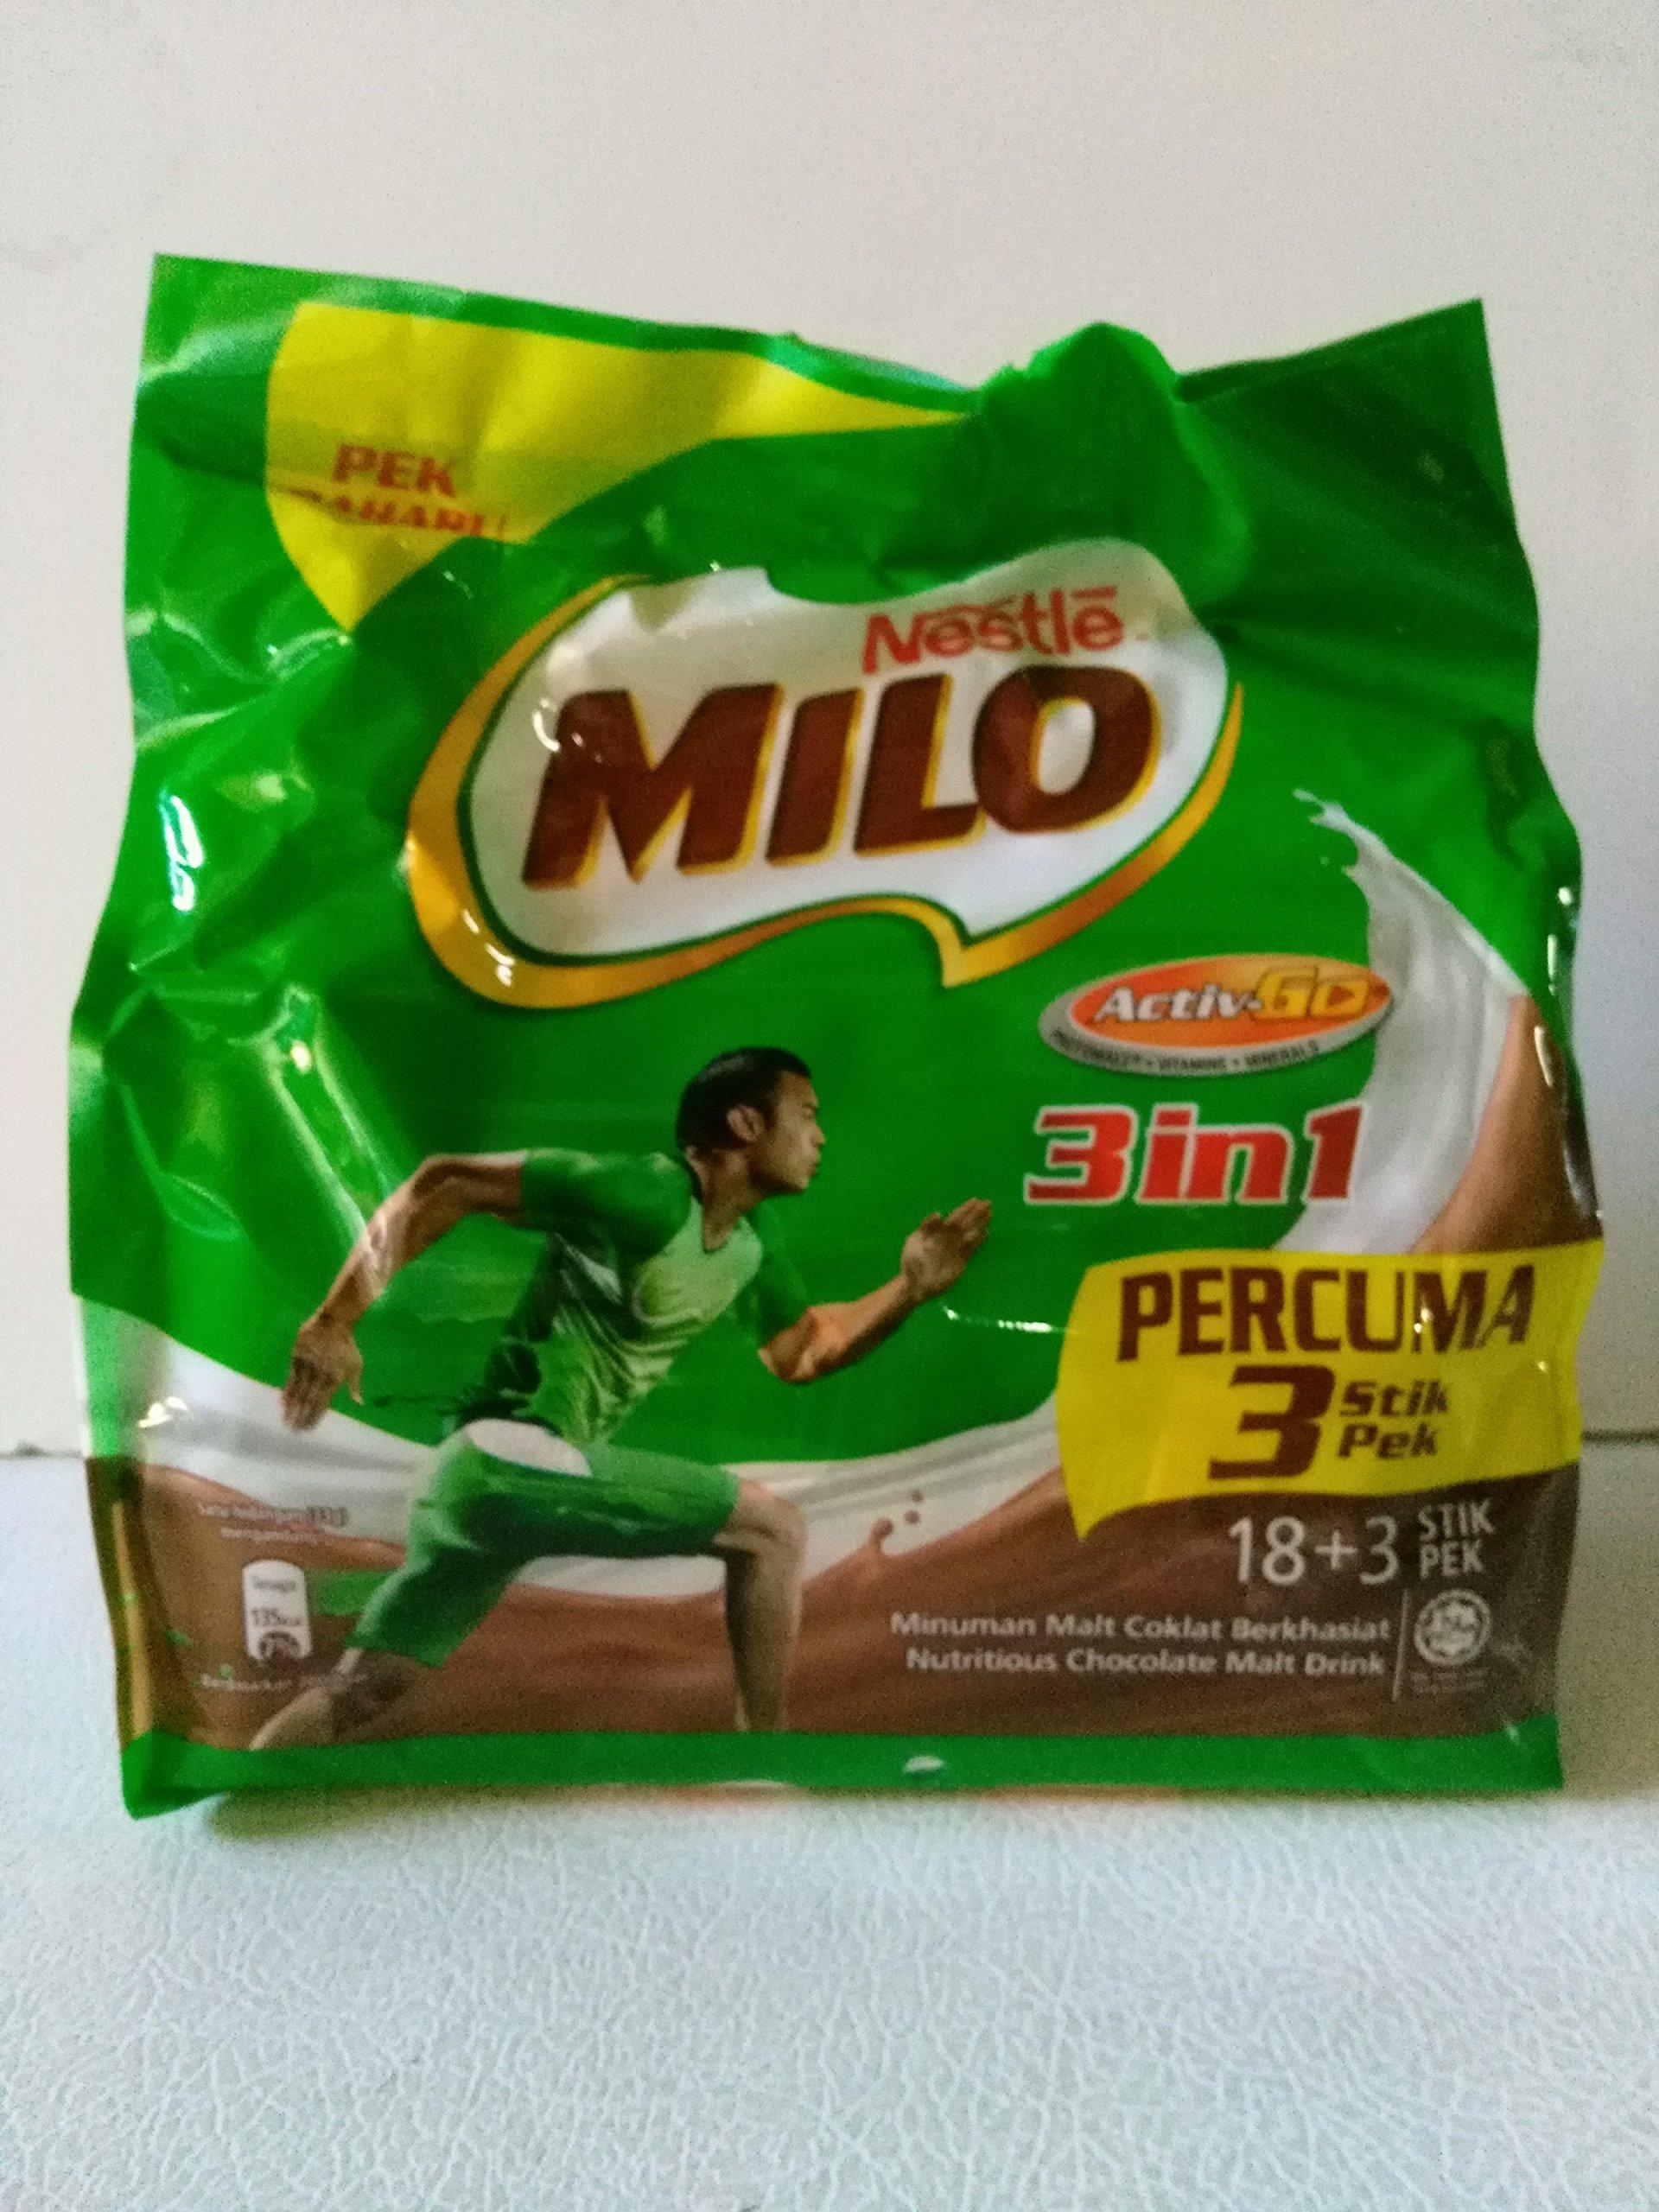 Milo Chocolate Malt Drink Activ-Go 3 in 1 33g